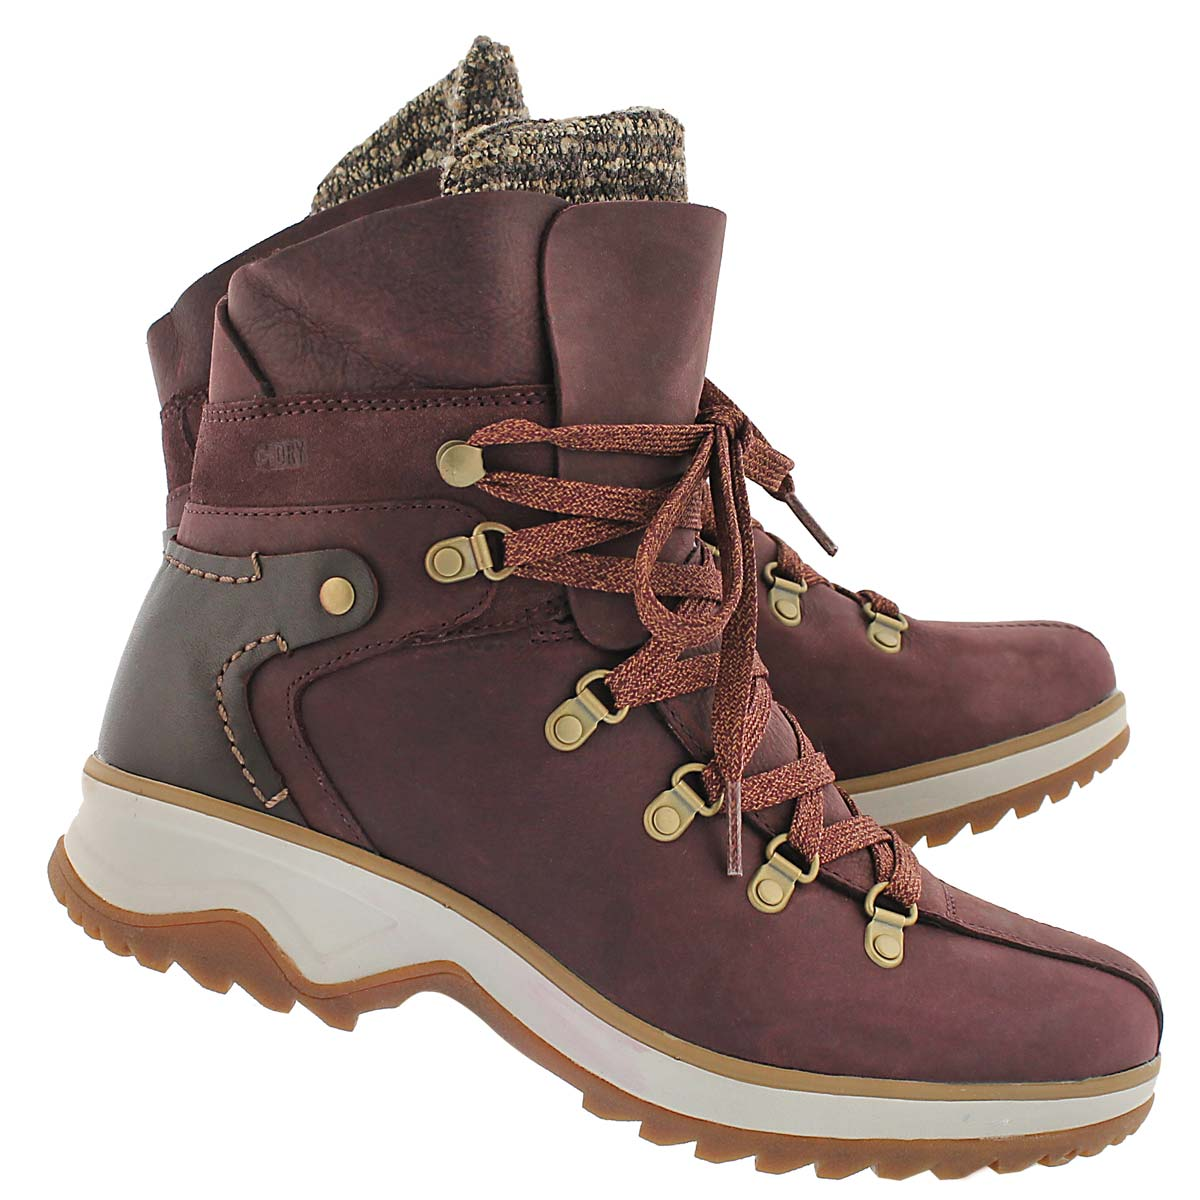 Lds Eventyr Ridge wine wtrpf winter boot